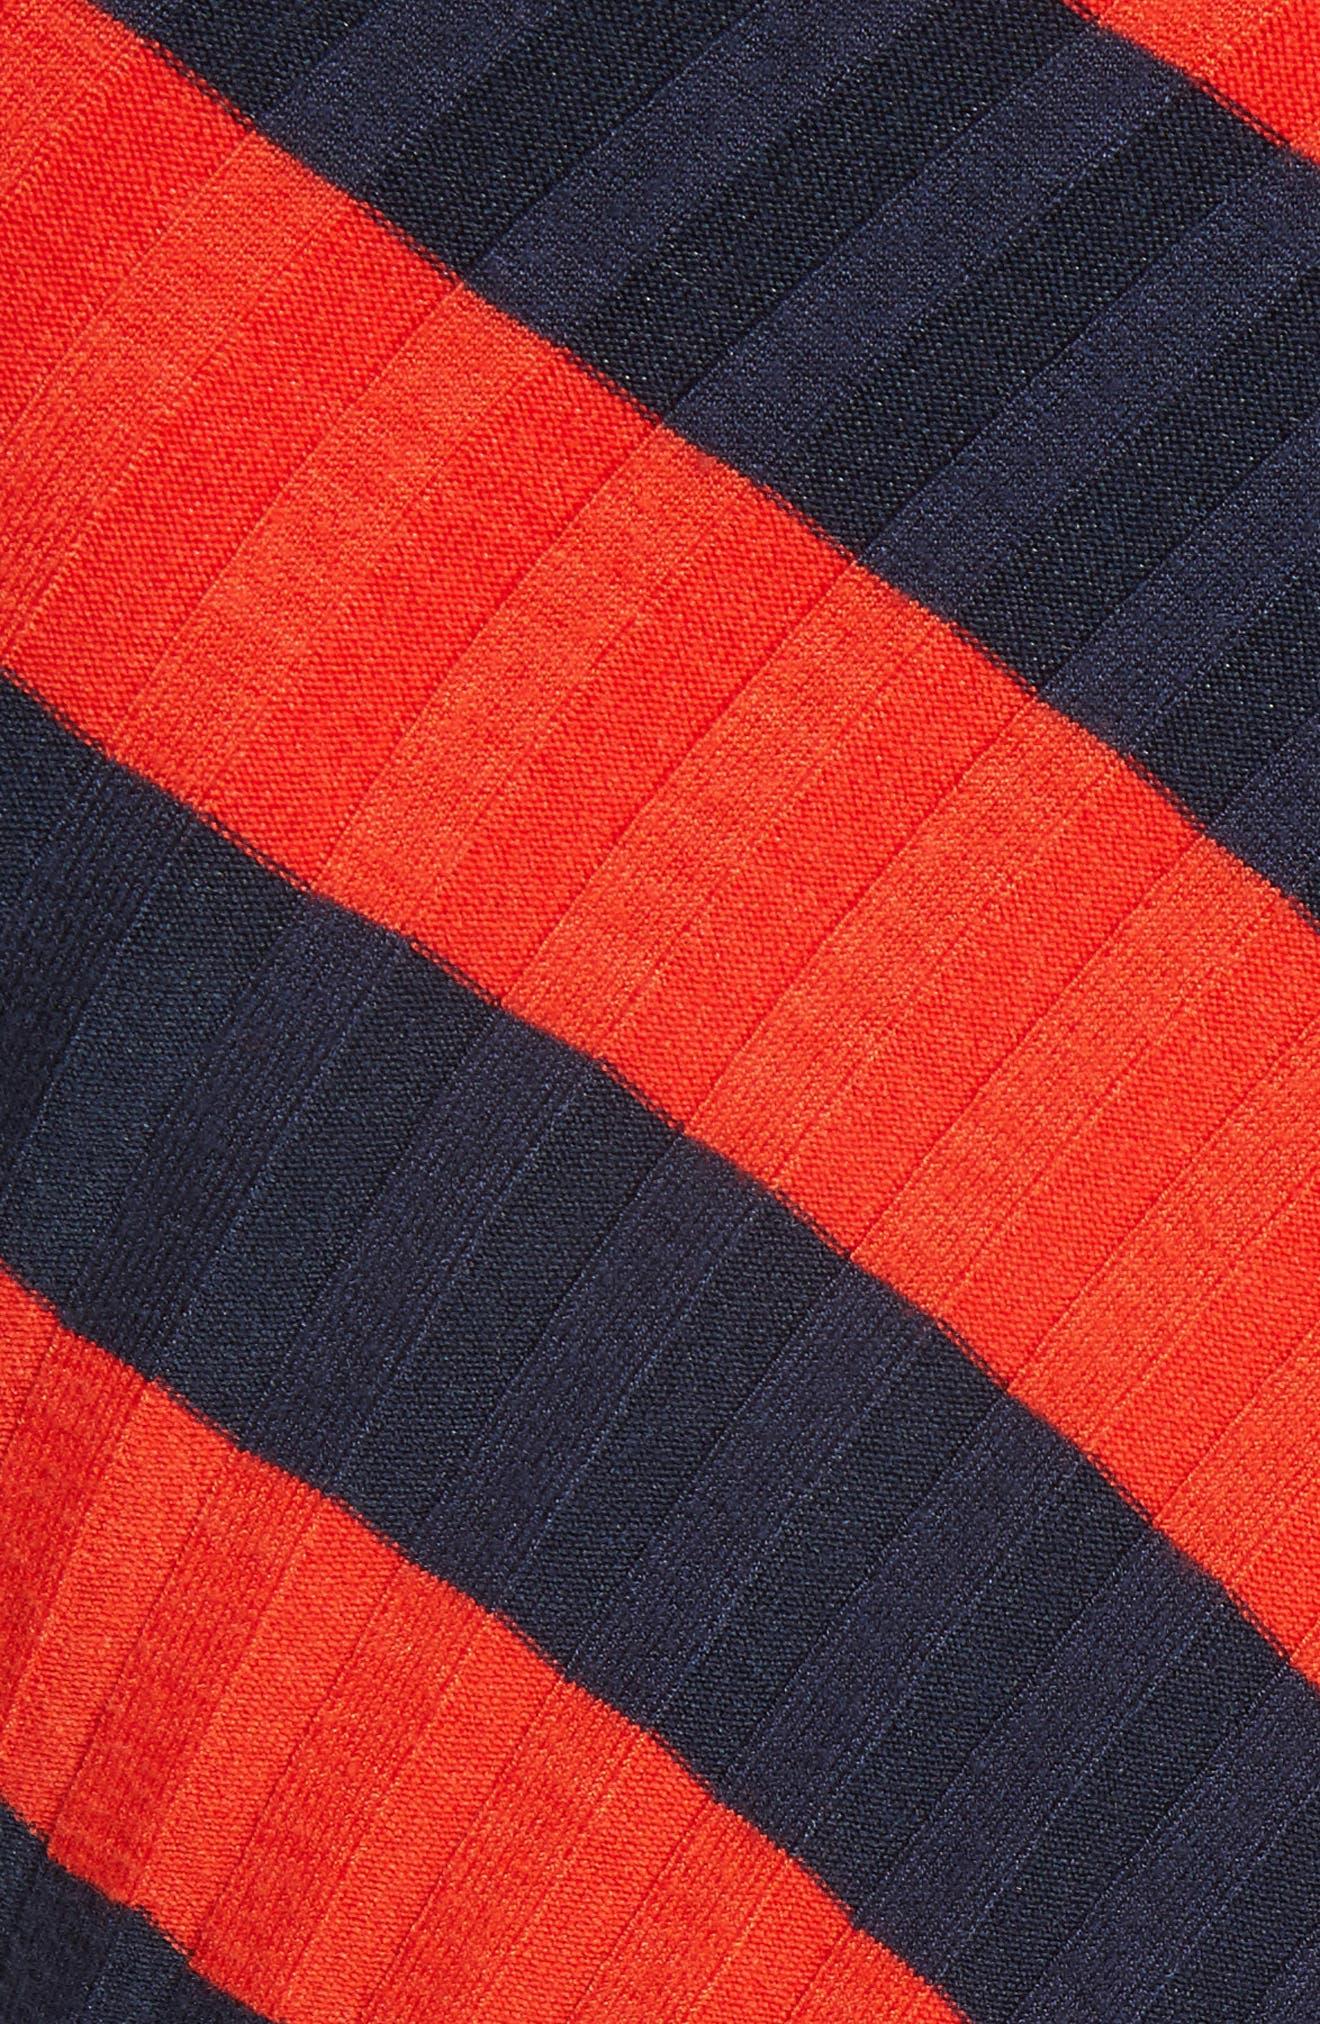 Asymmetrical Stripe Sweater,                             Alternate thumbnail 5, color,                             830